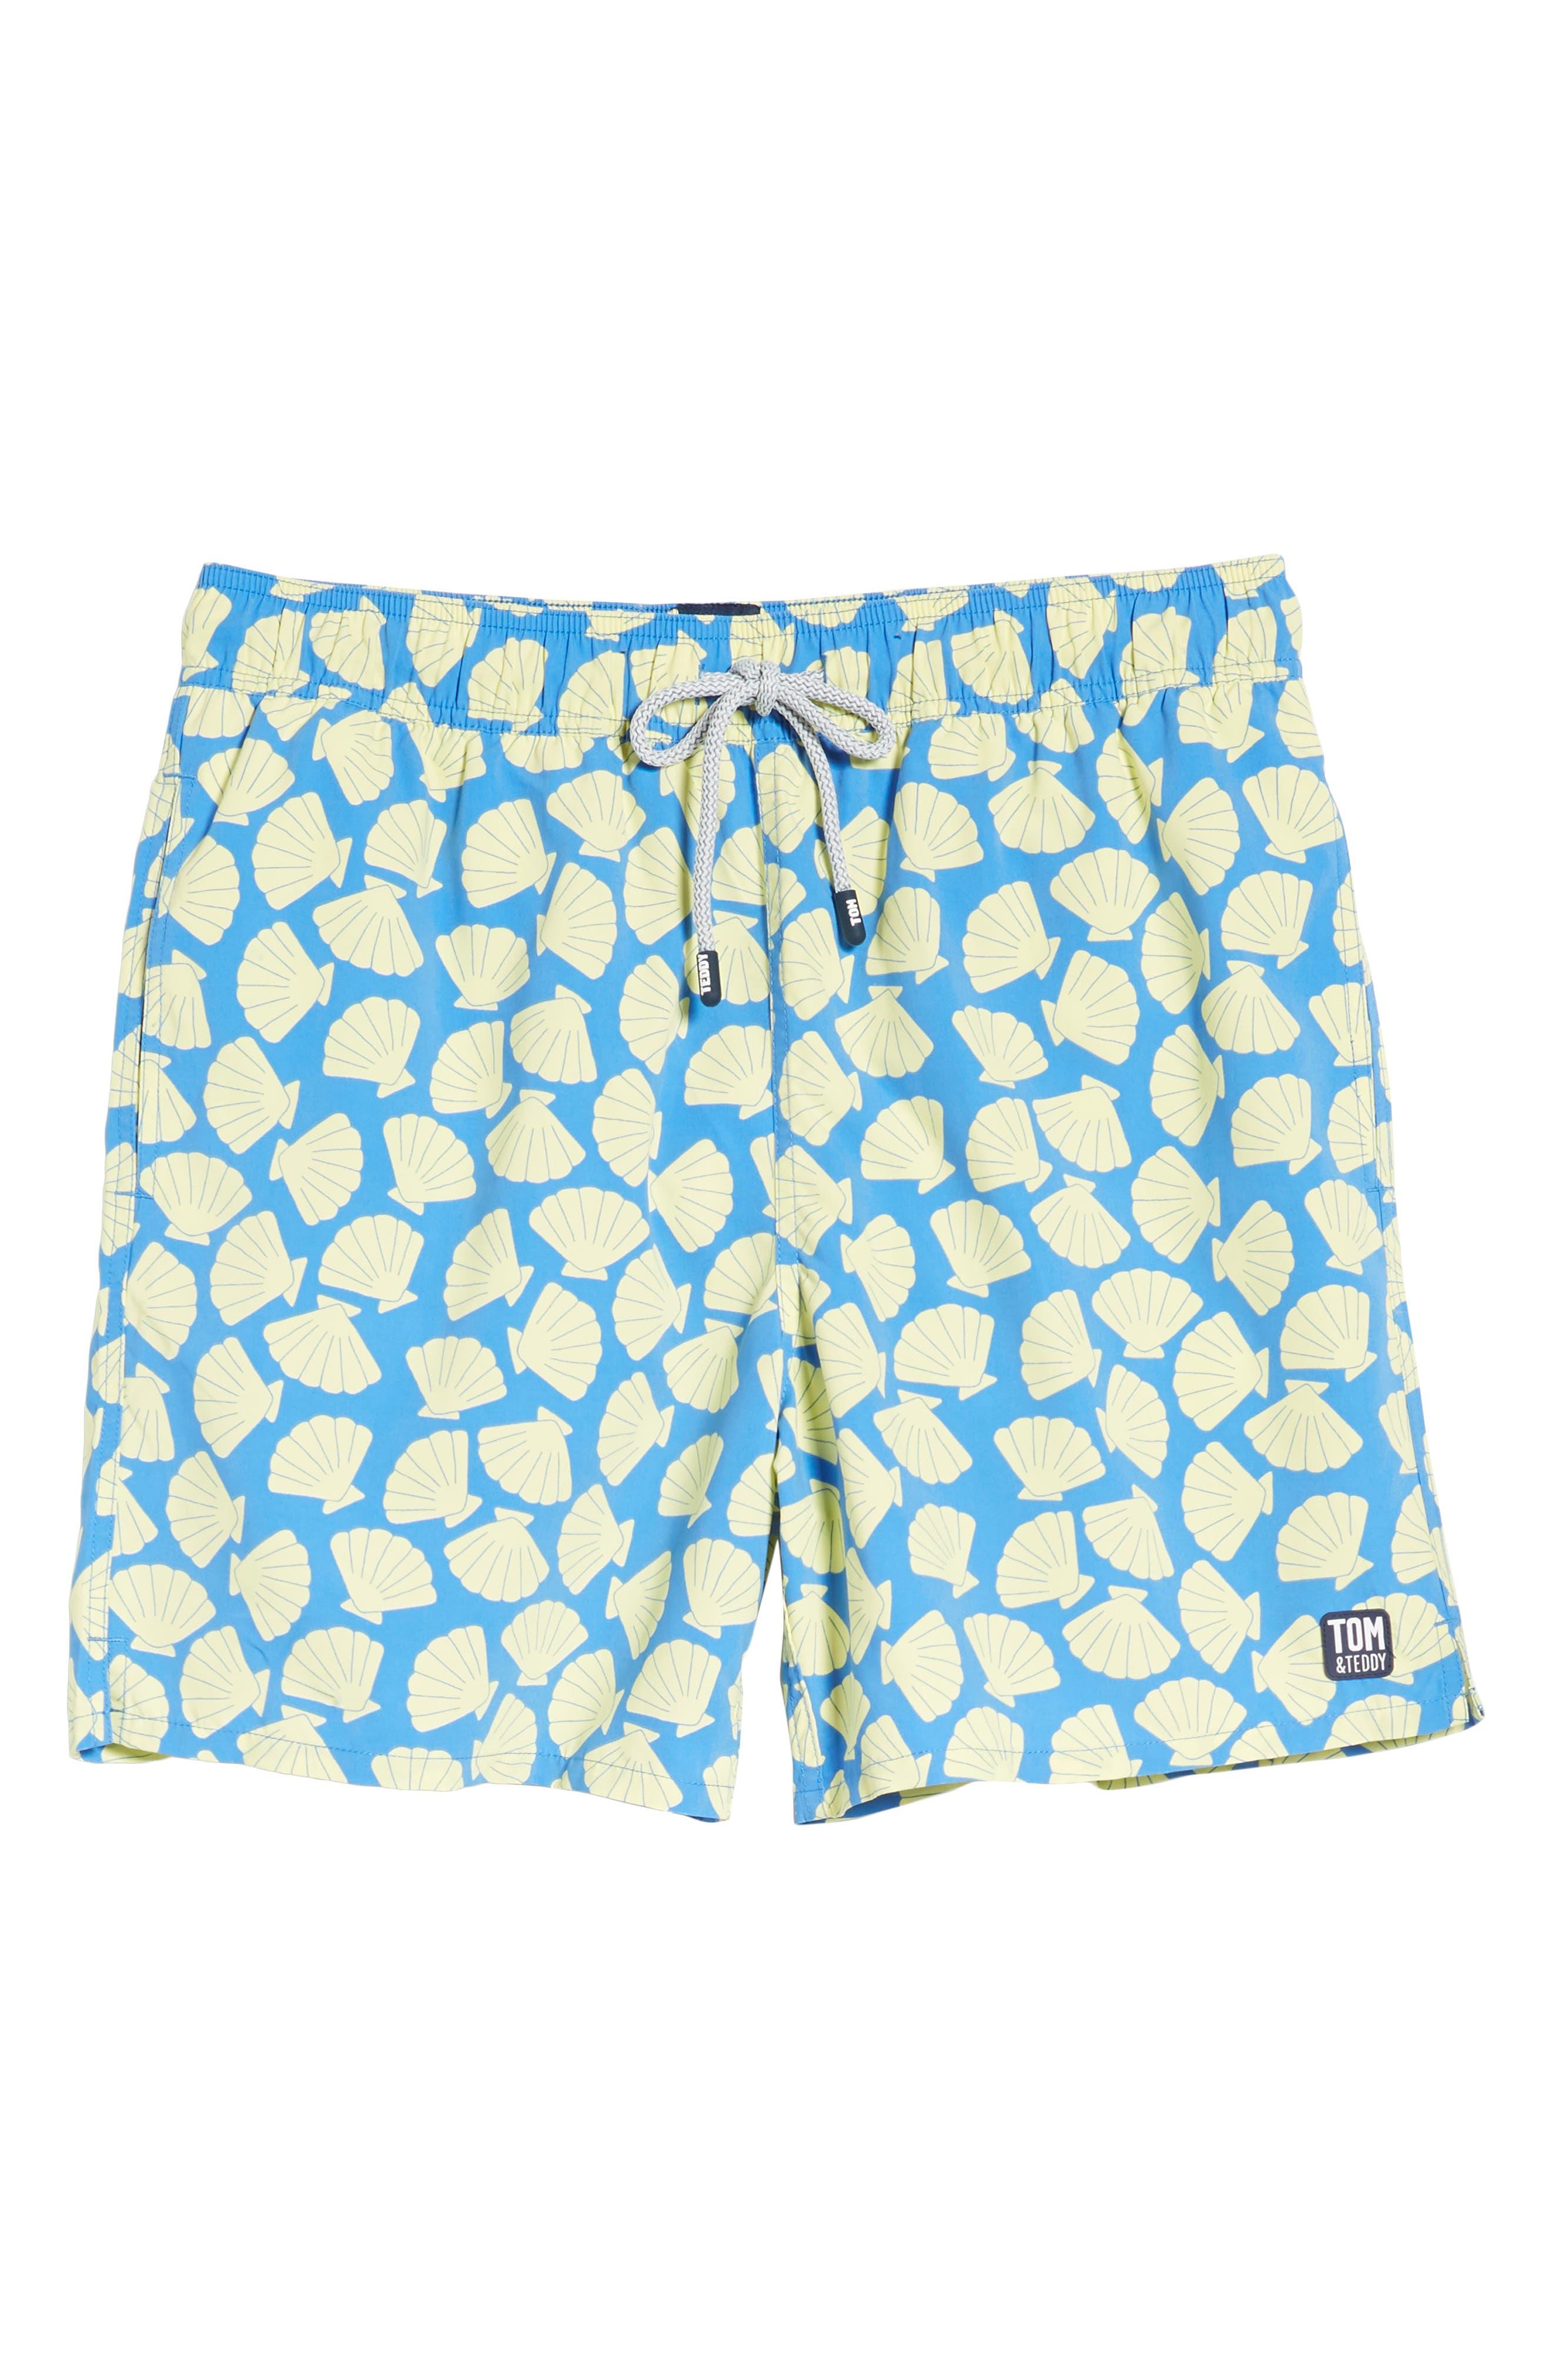 Shell Print Swim Trunks,                             Alternate thumbnail 6, color,                             Yellow